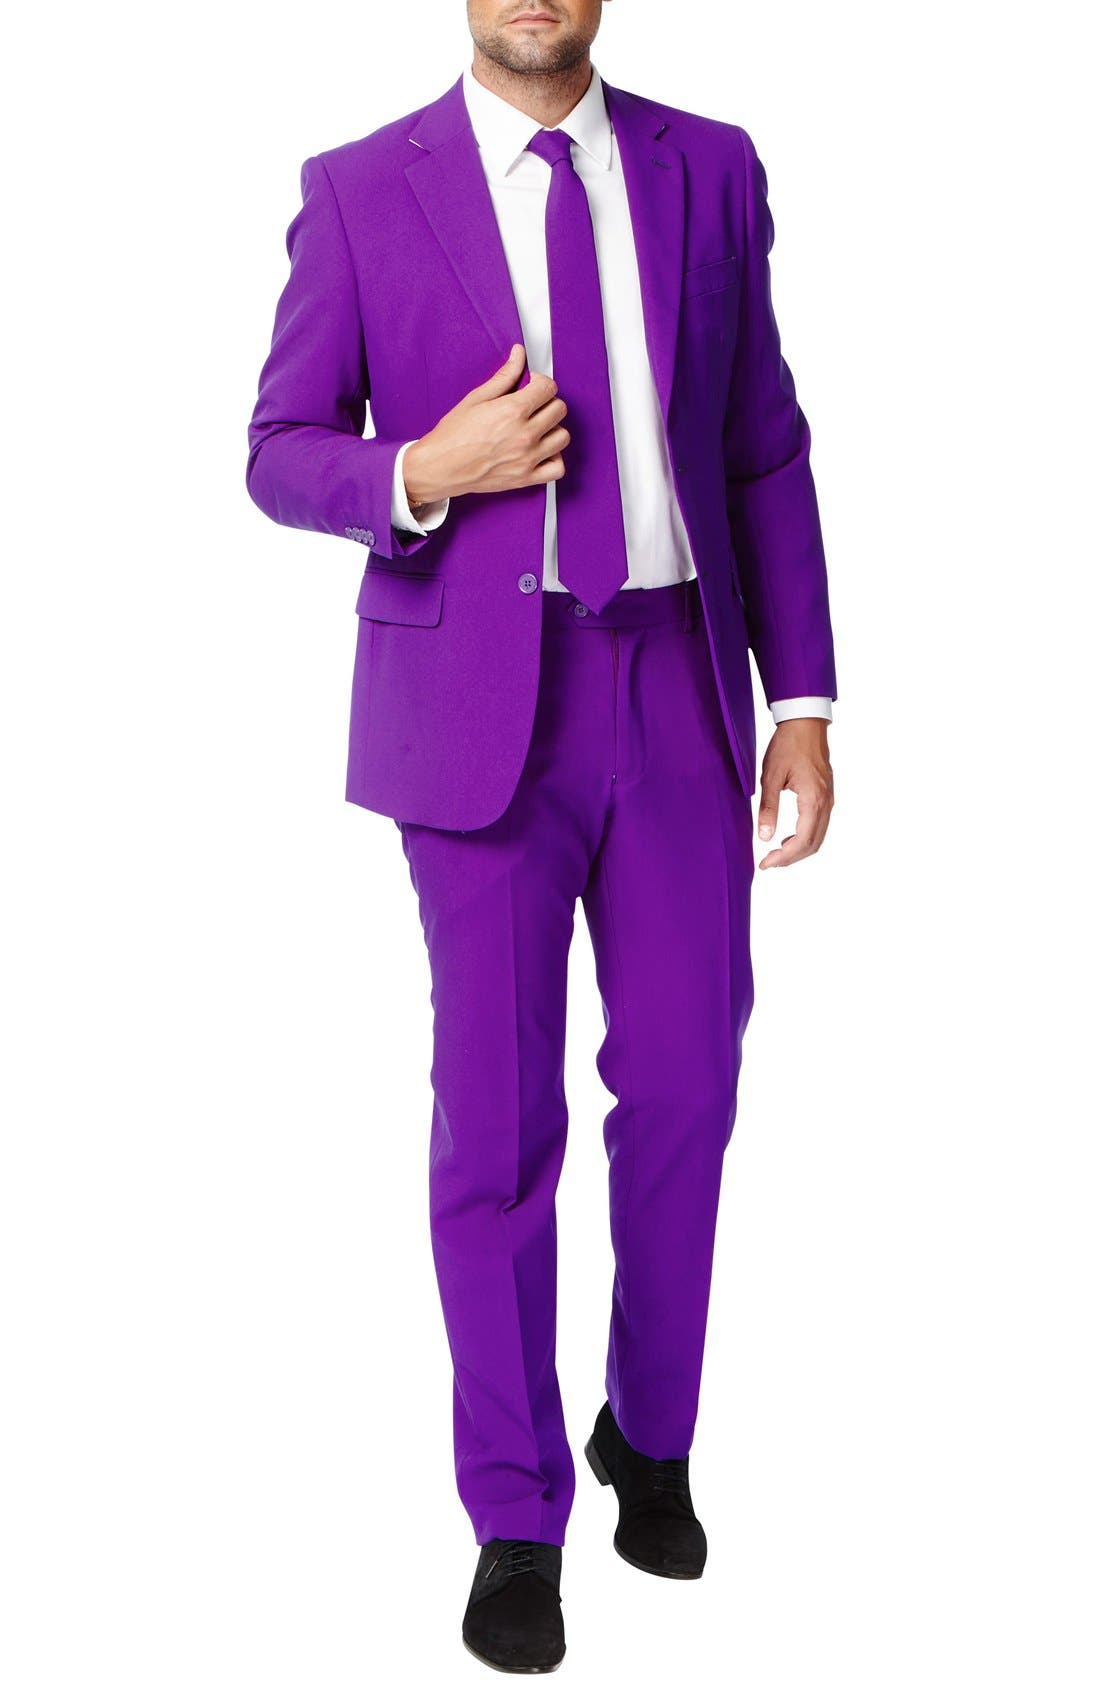 'Purple Prince' Trim Fit Two-Piece Suit with Tie,                         Main,                         color, 500